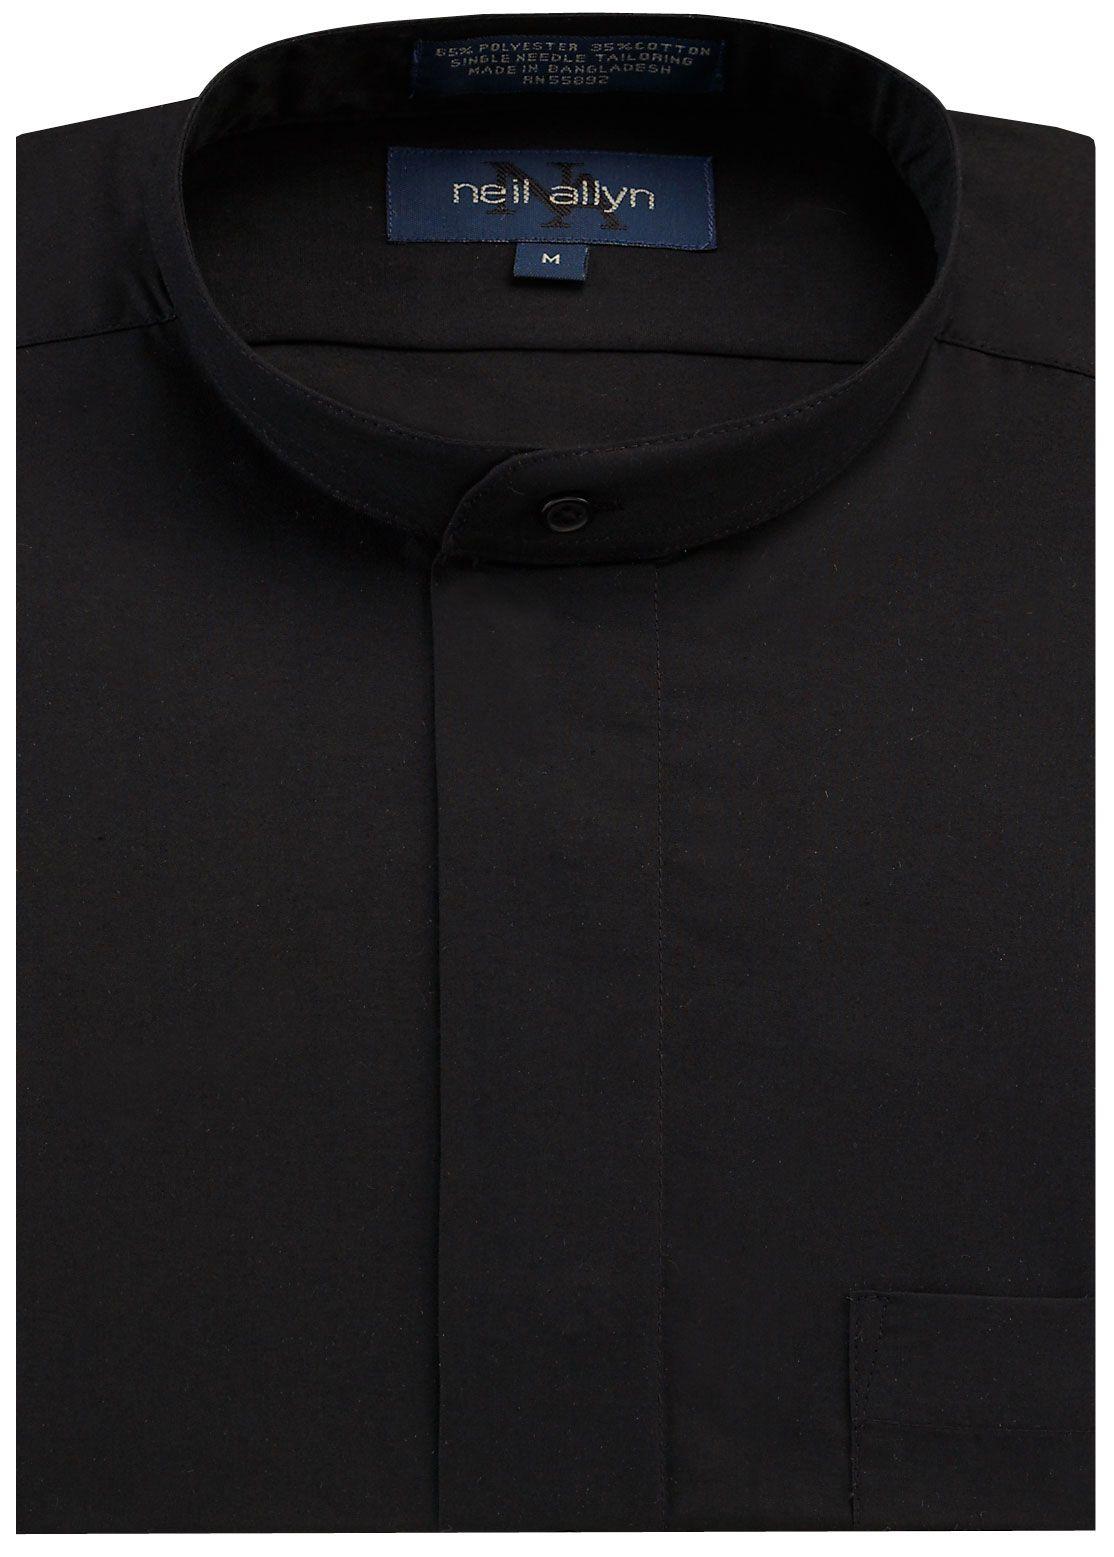 Black Mandarin Tuxedo Shirt with Fly Front | gimmee | Pinterest ...